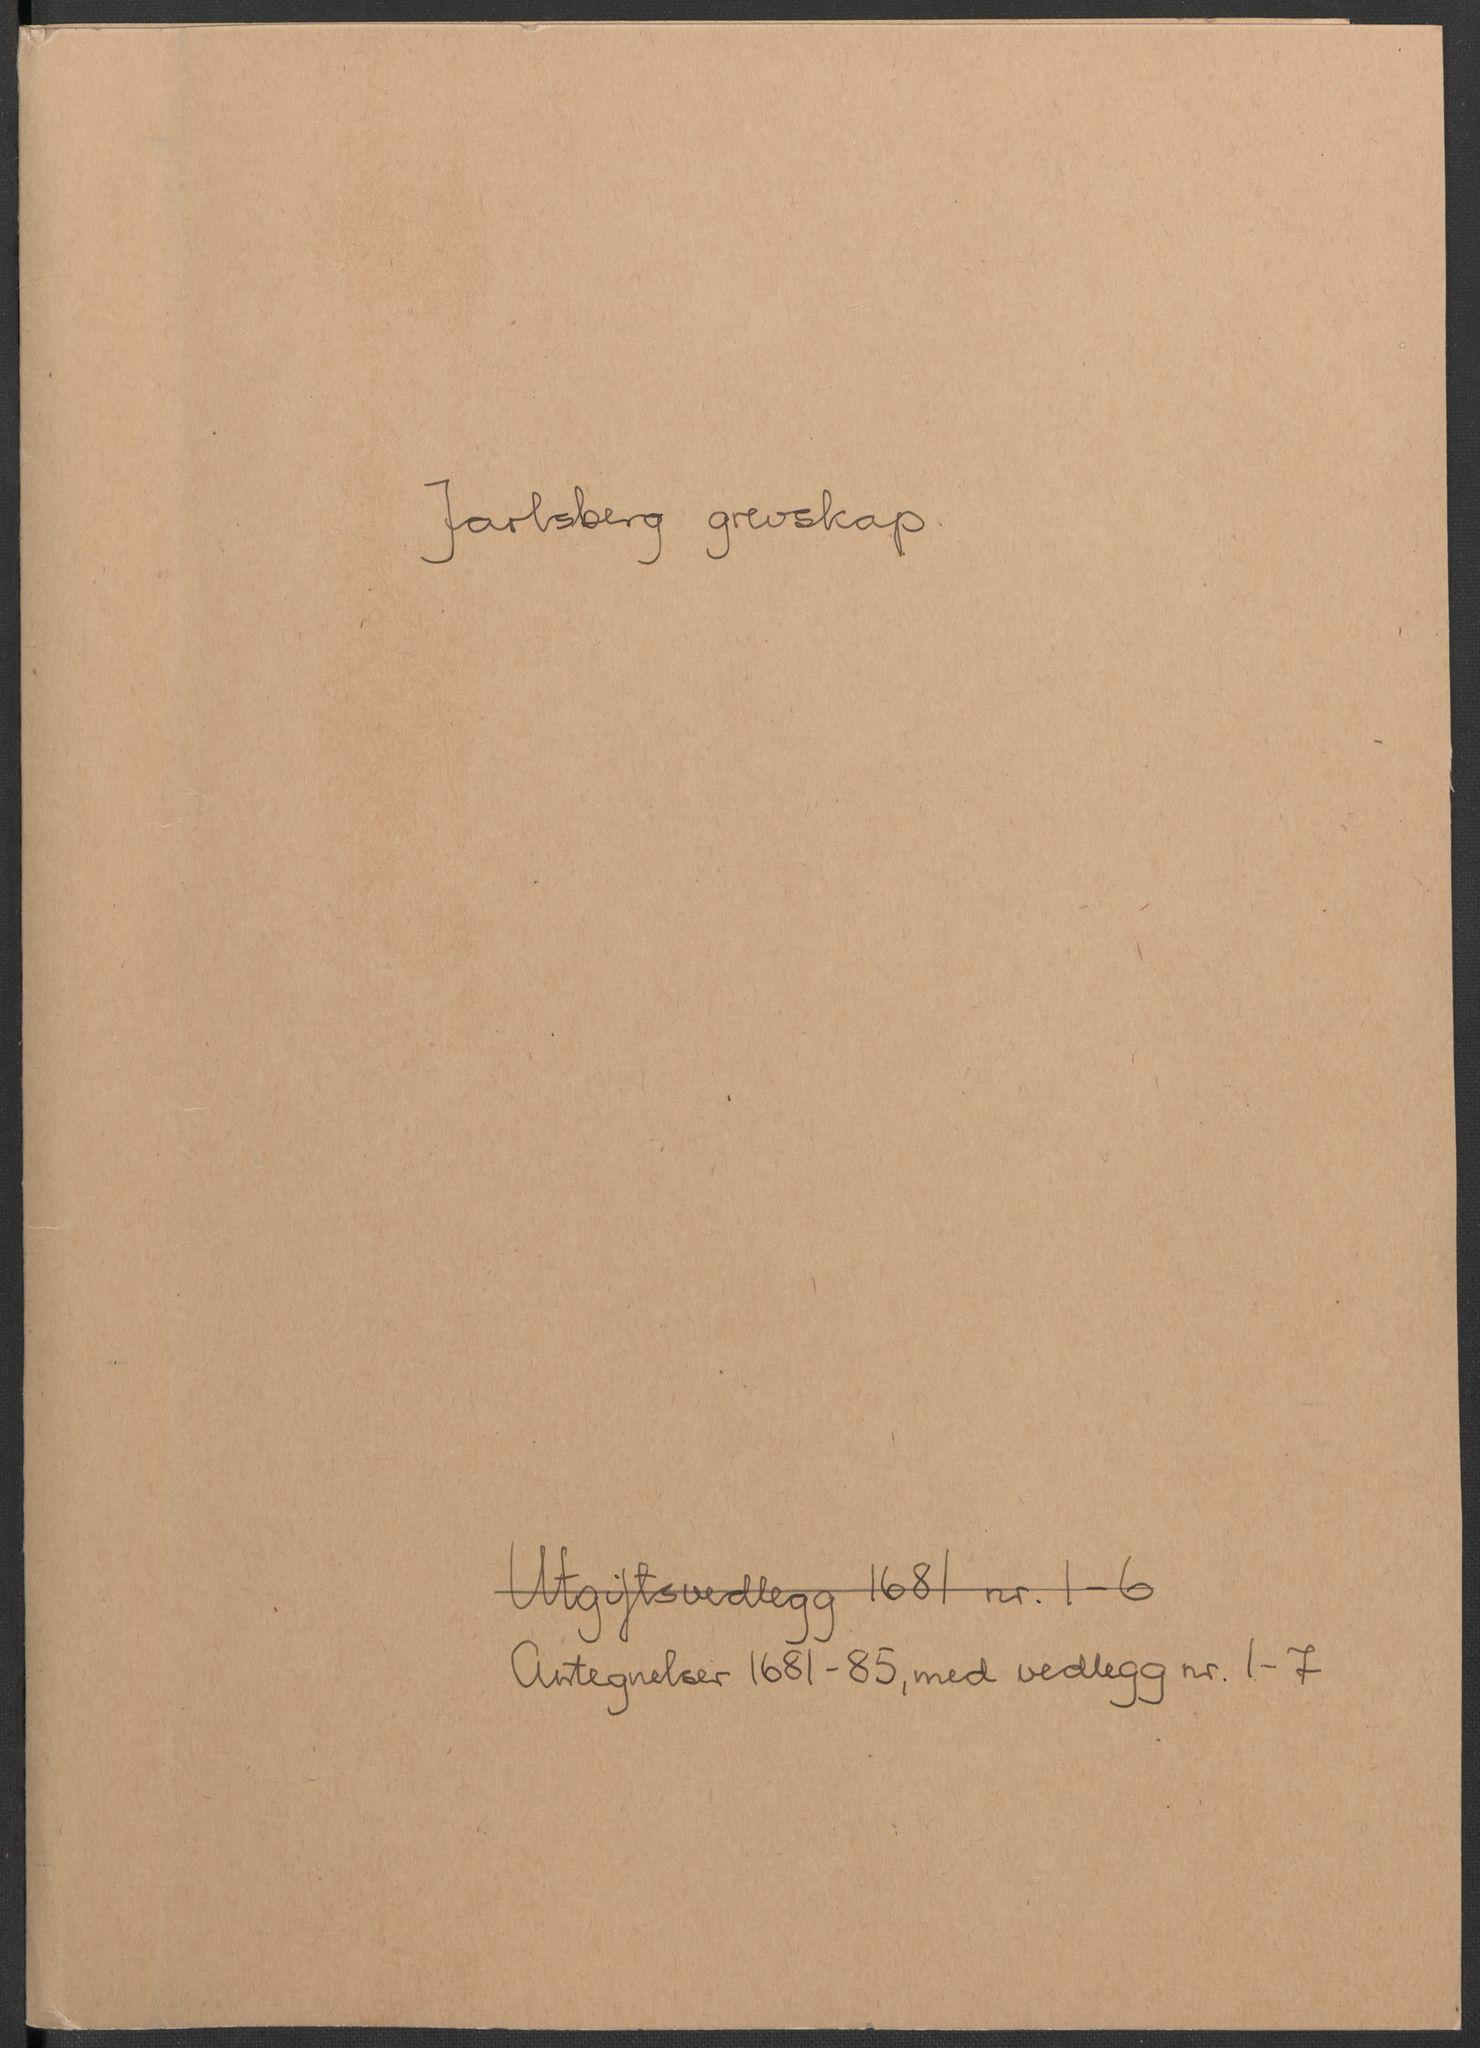 RA, Rentekammeret inntil 1814, Reviderte regnskaper, Fogderegnskap, R32/L1856: Fogderegnskap Jarlsberg grevskap, 1685, s. 370